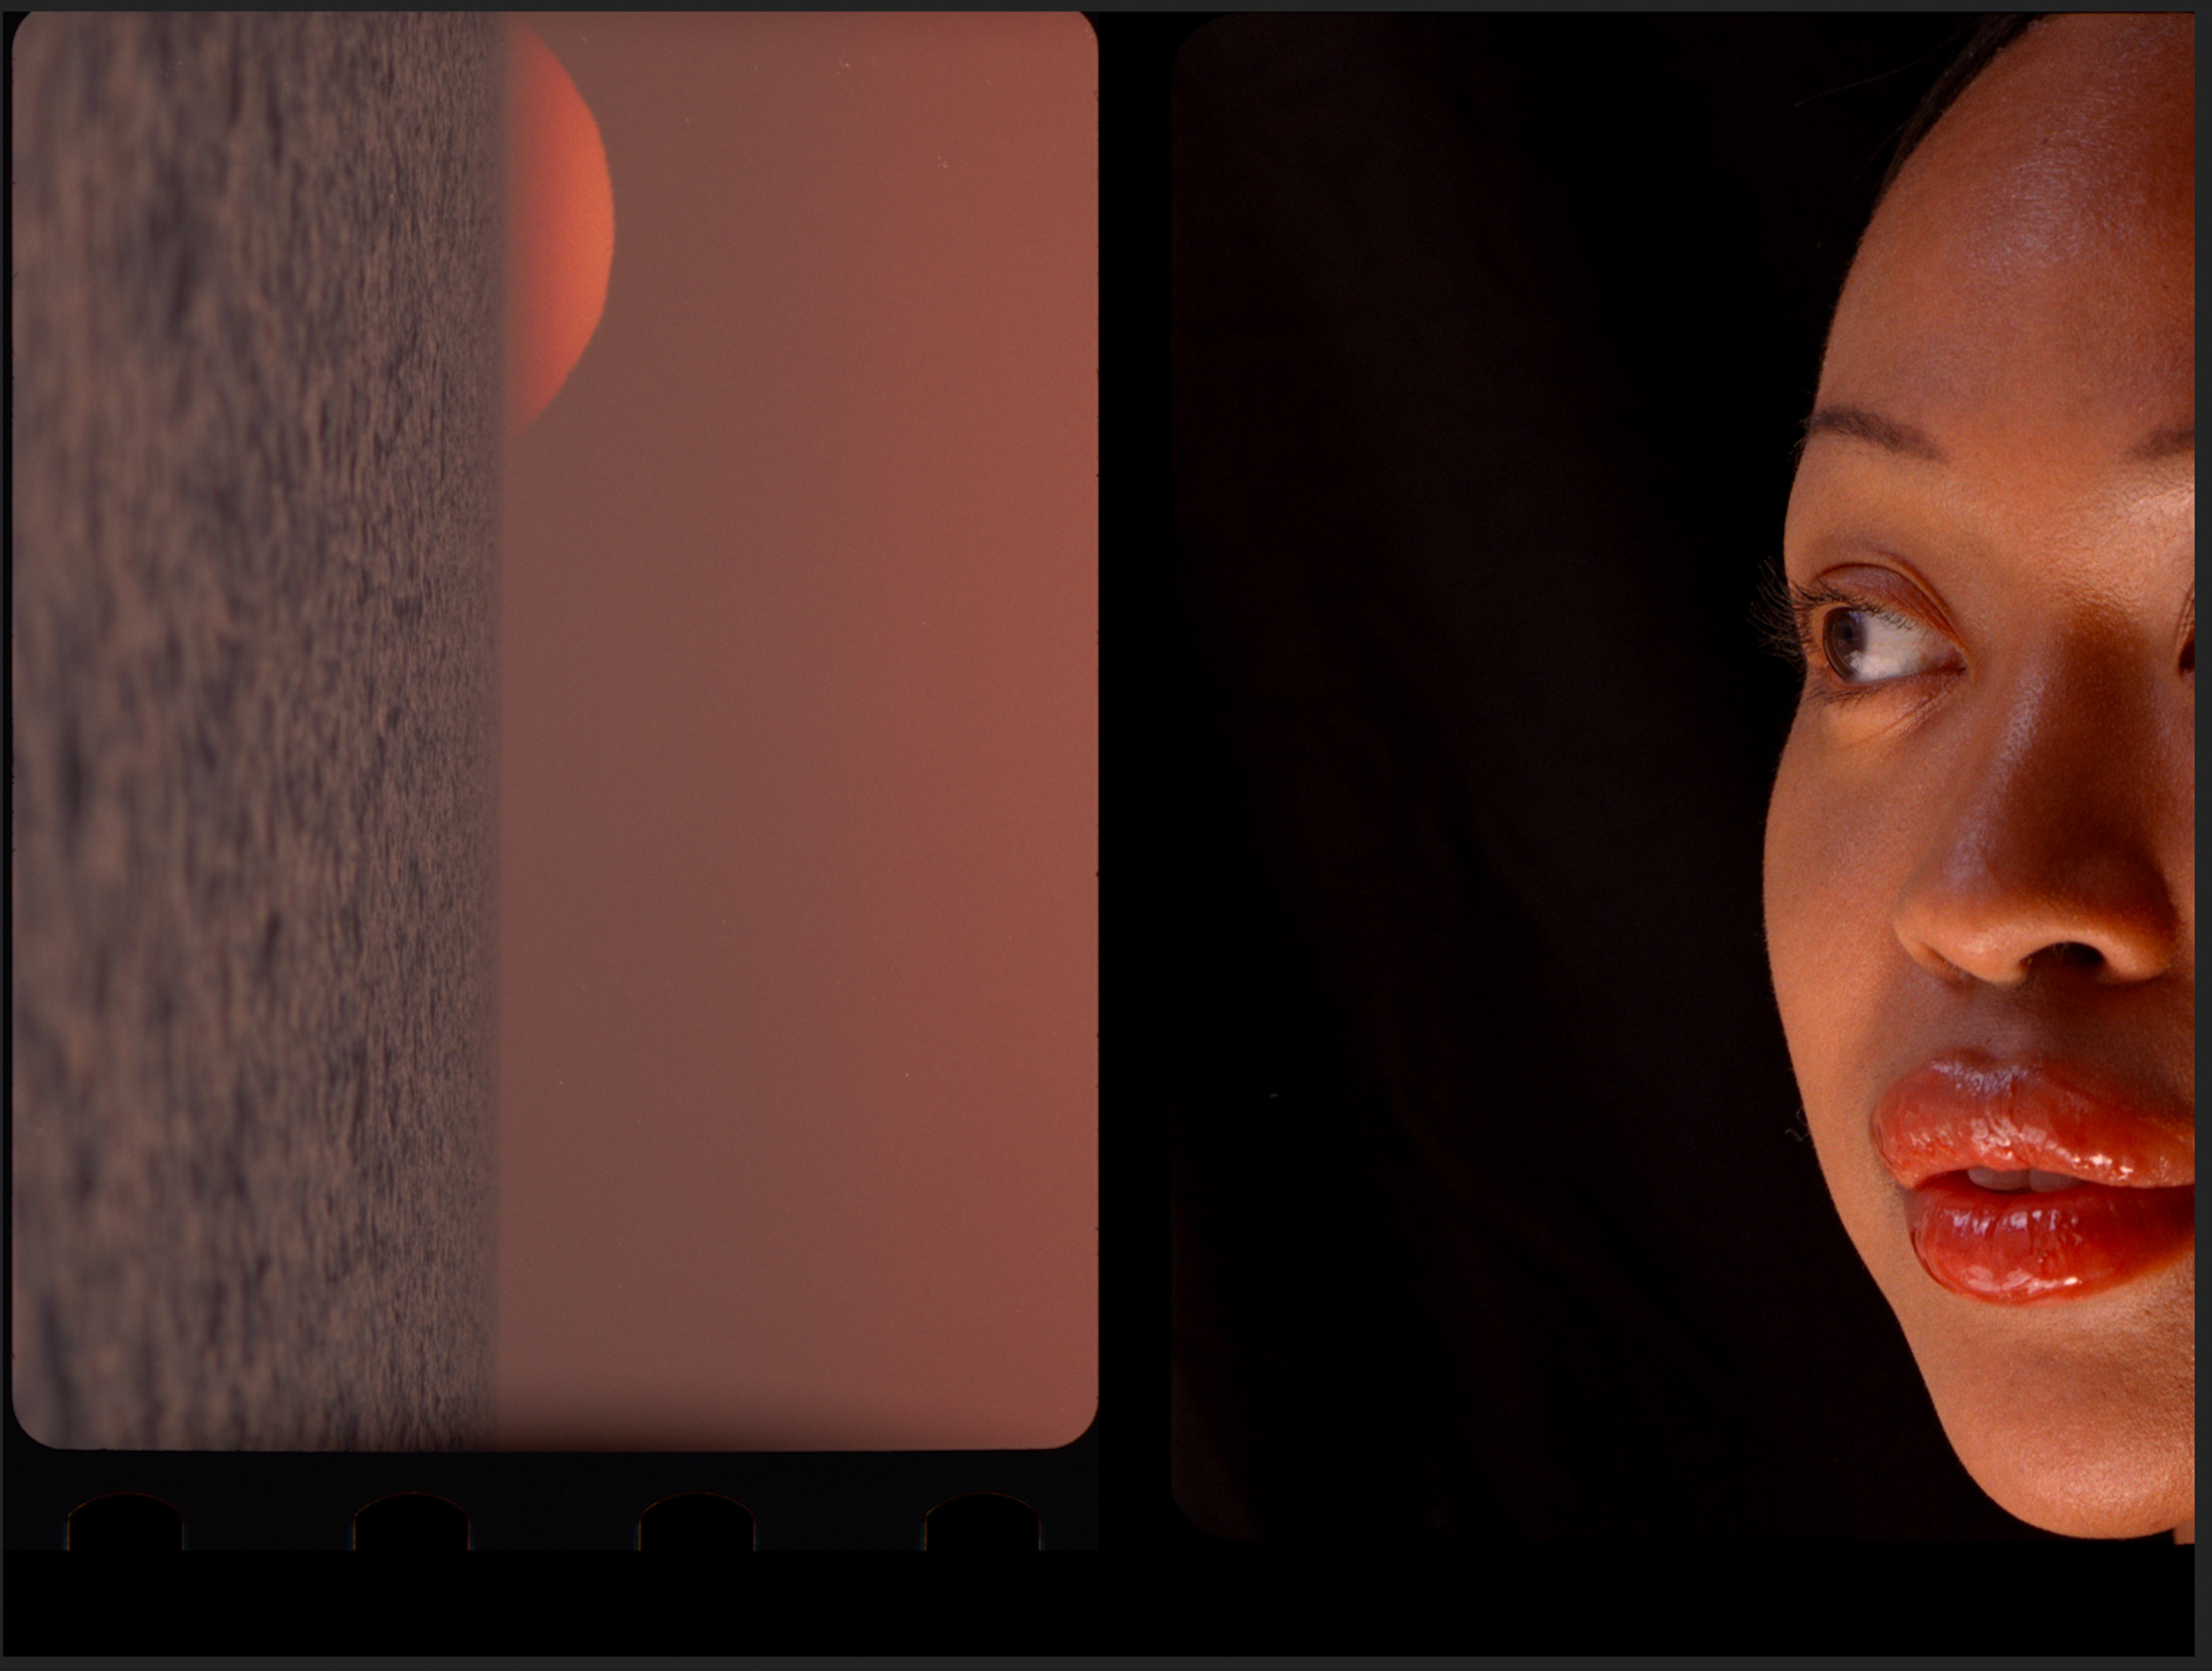 Video still from Dara Friedman, The Crowning, 2021